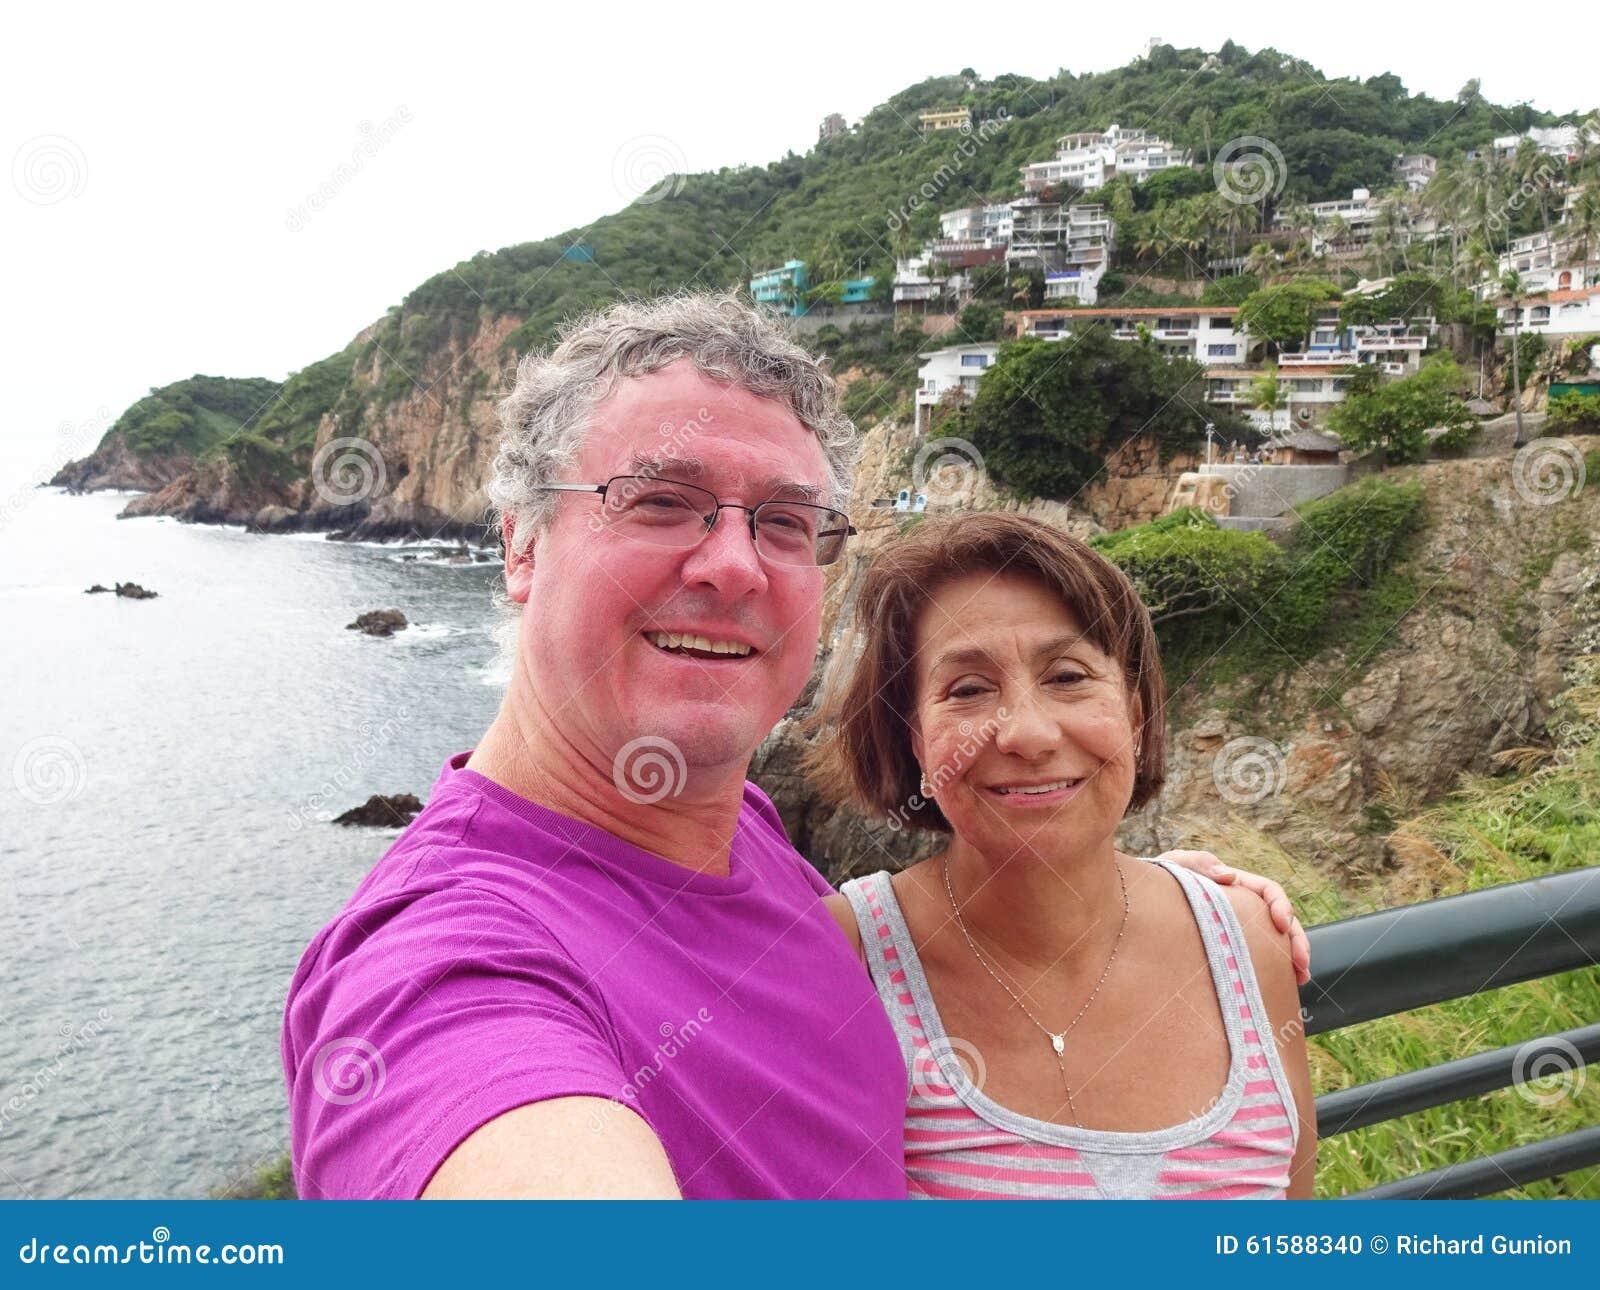 Acapulco Selfie in Mexico